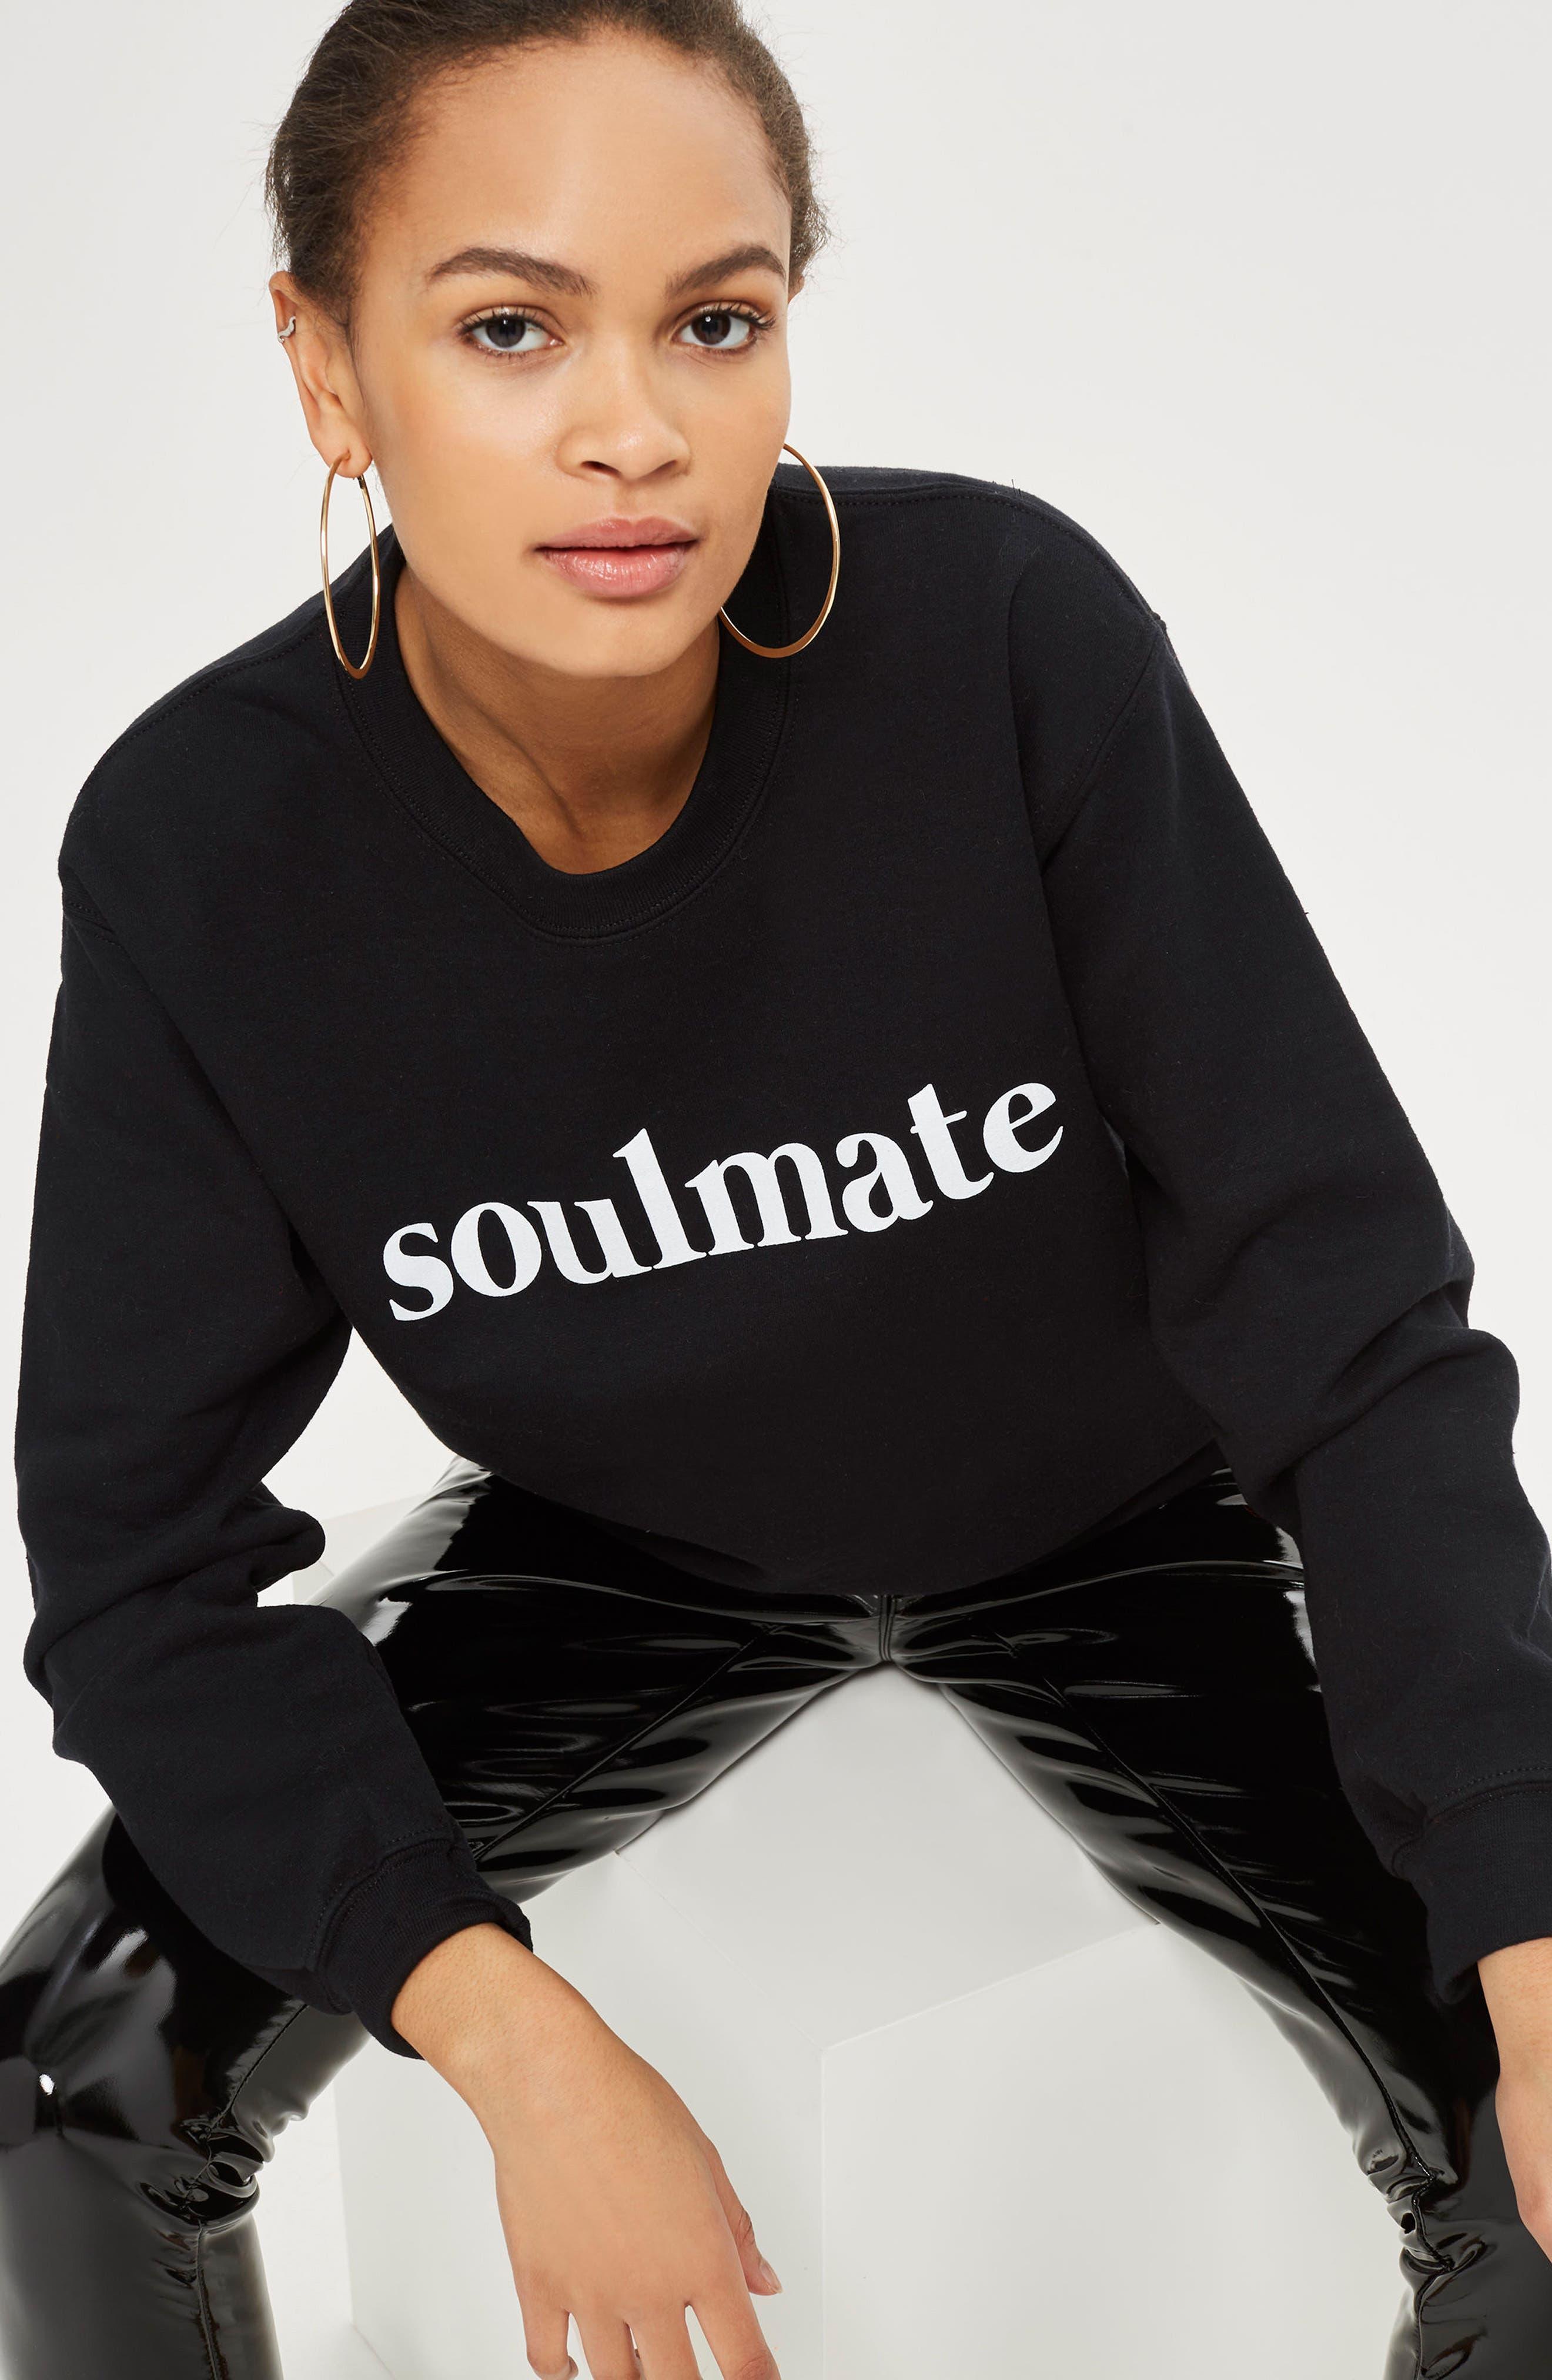 Soulmate Graphic Sweatshirt,                             Alternate thumbnail 2, color,                             Black Multi